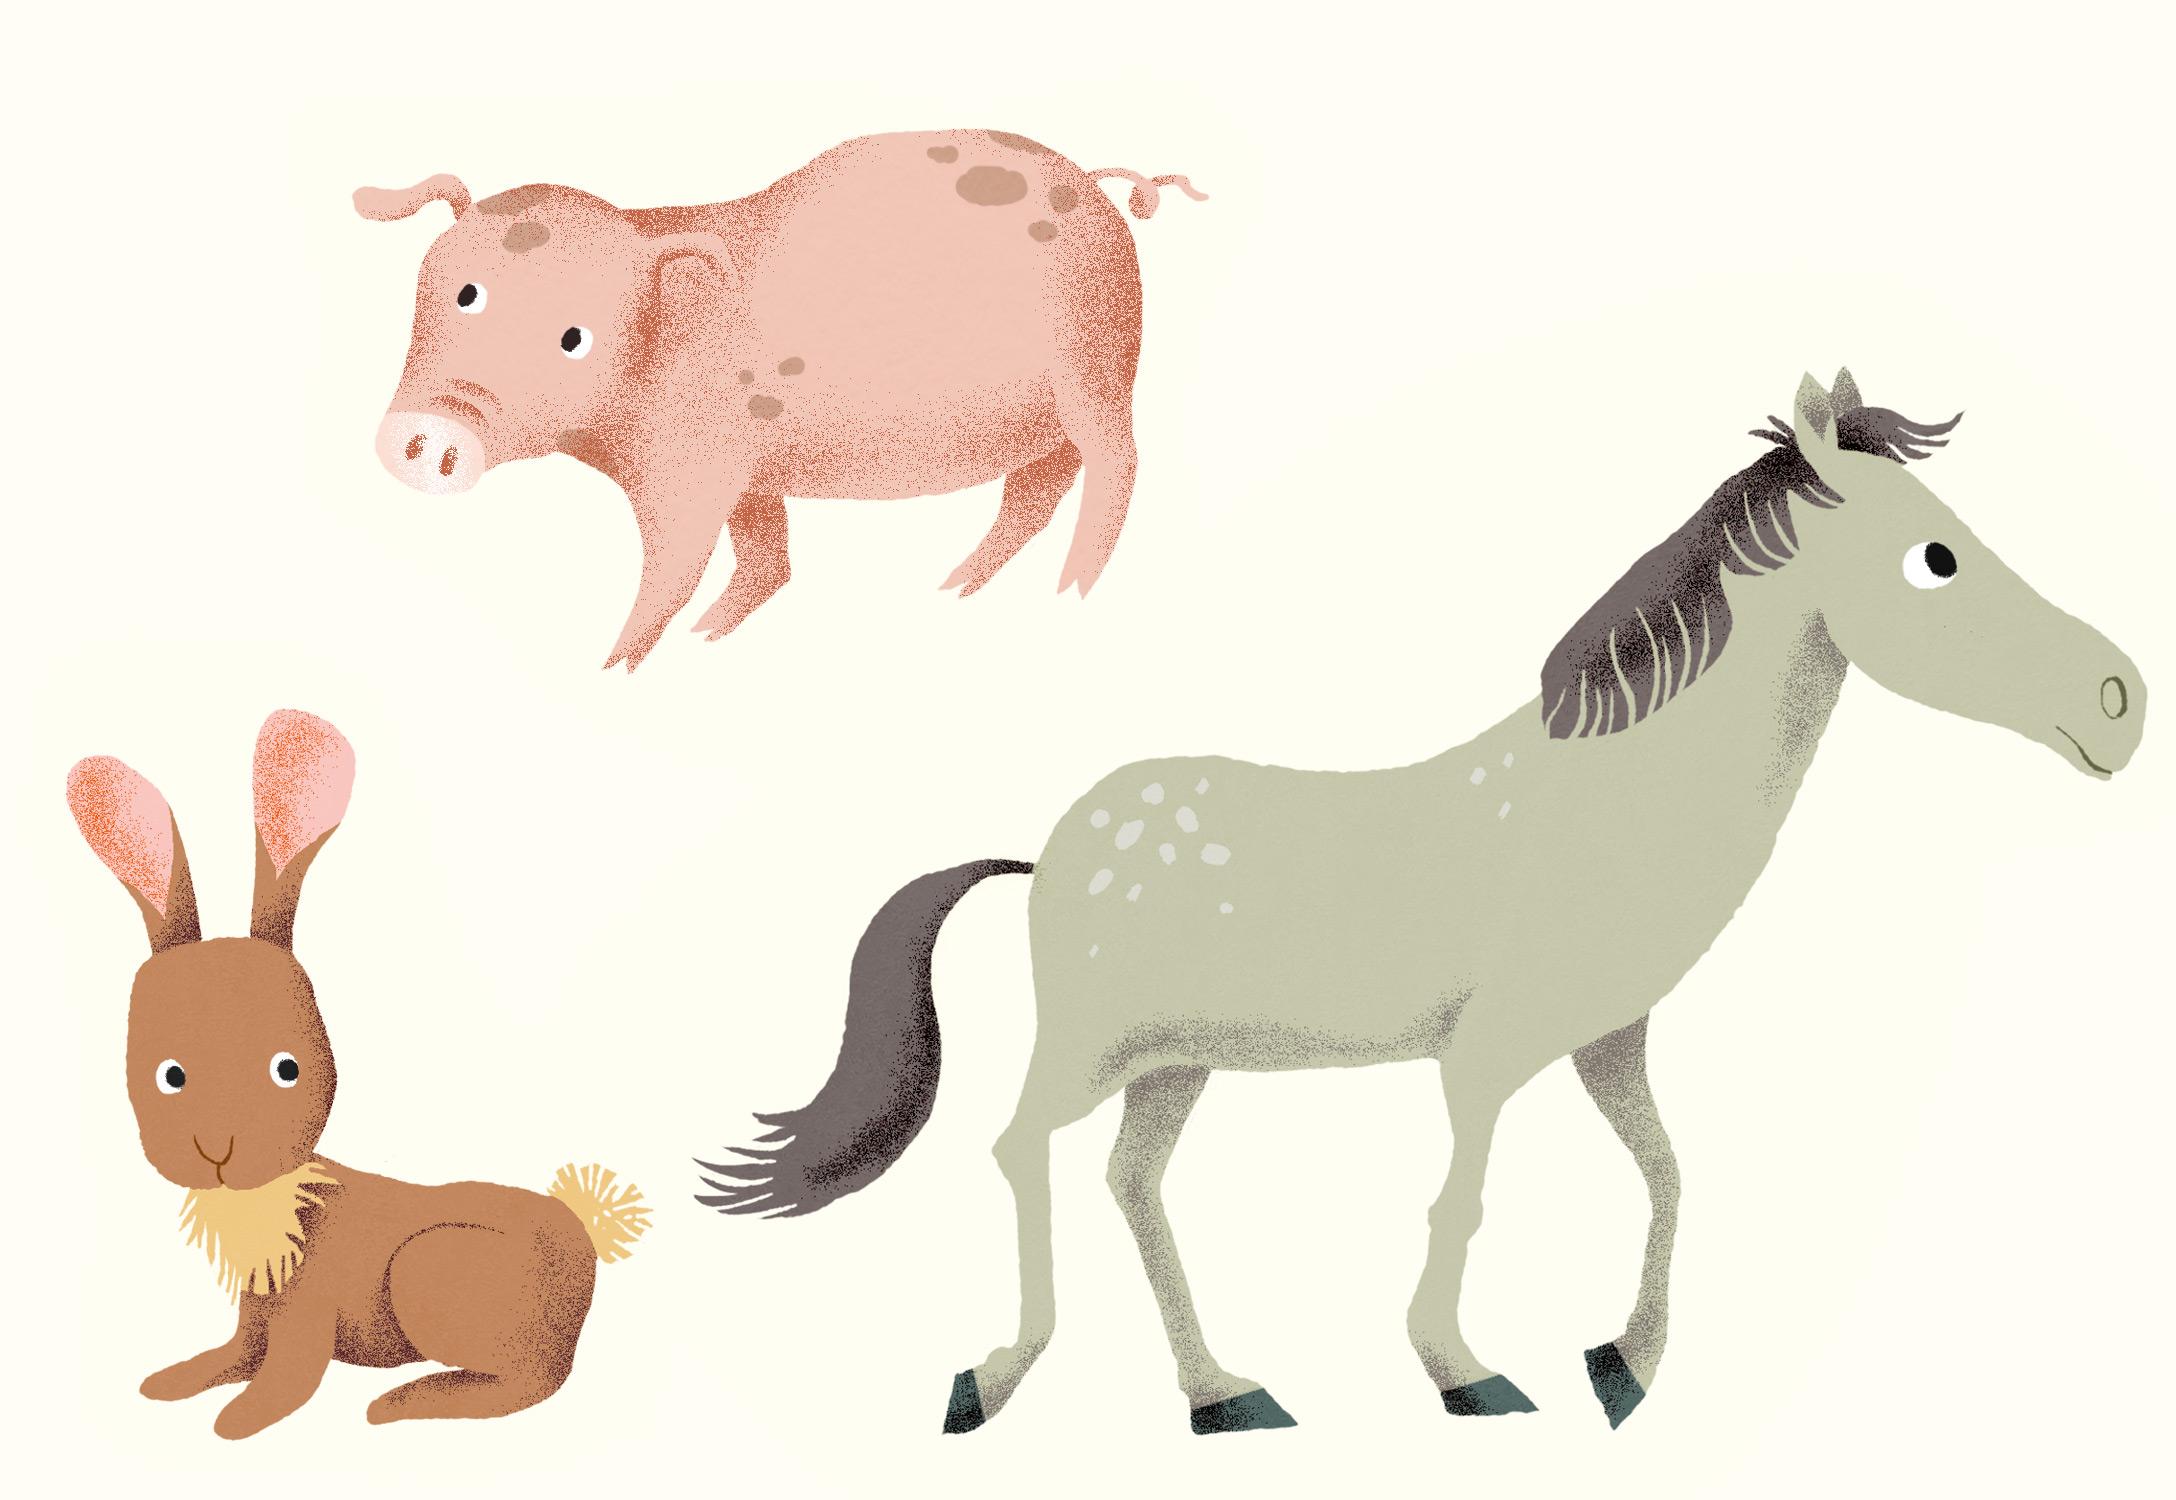 Annalisa Papagna illustration - Farm animals: horse, pig, bunny